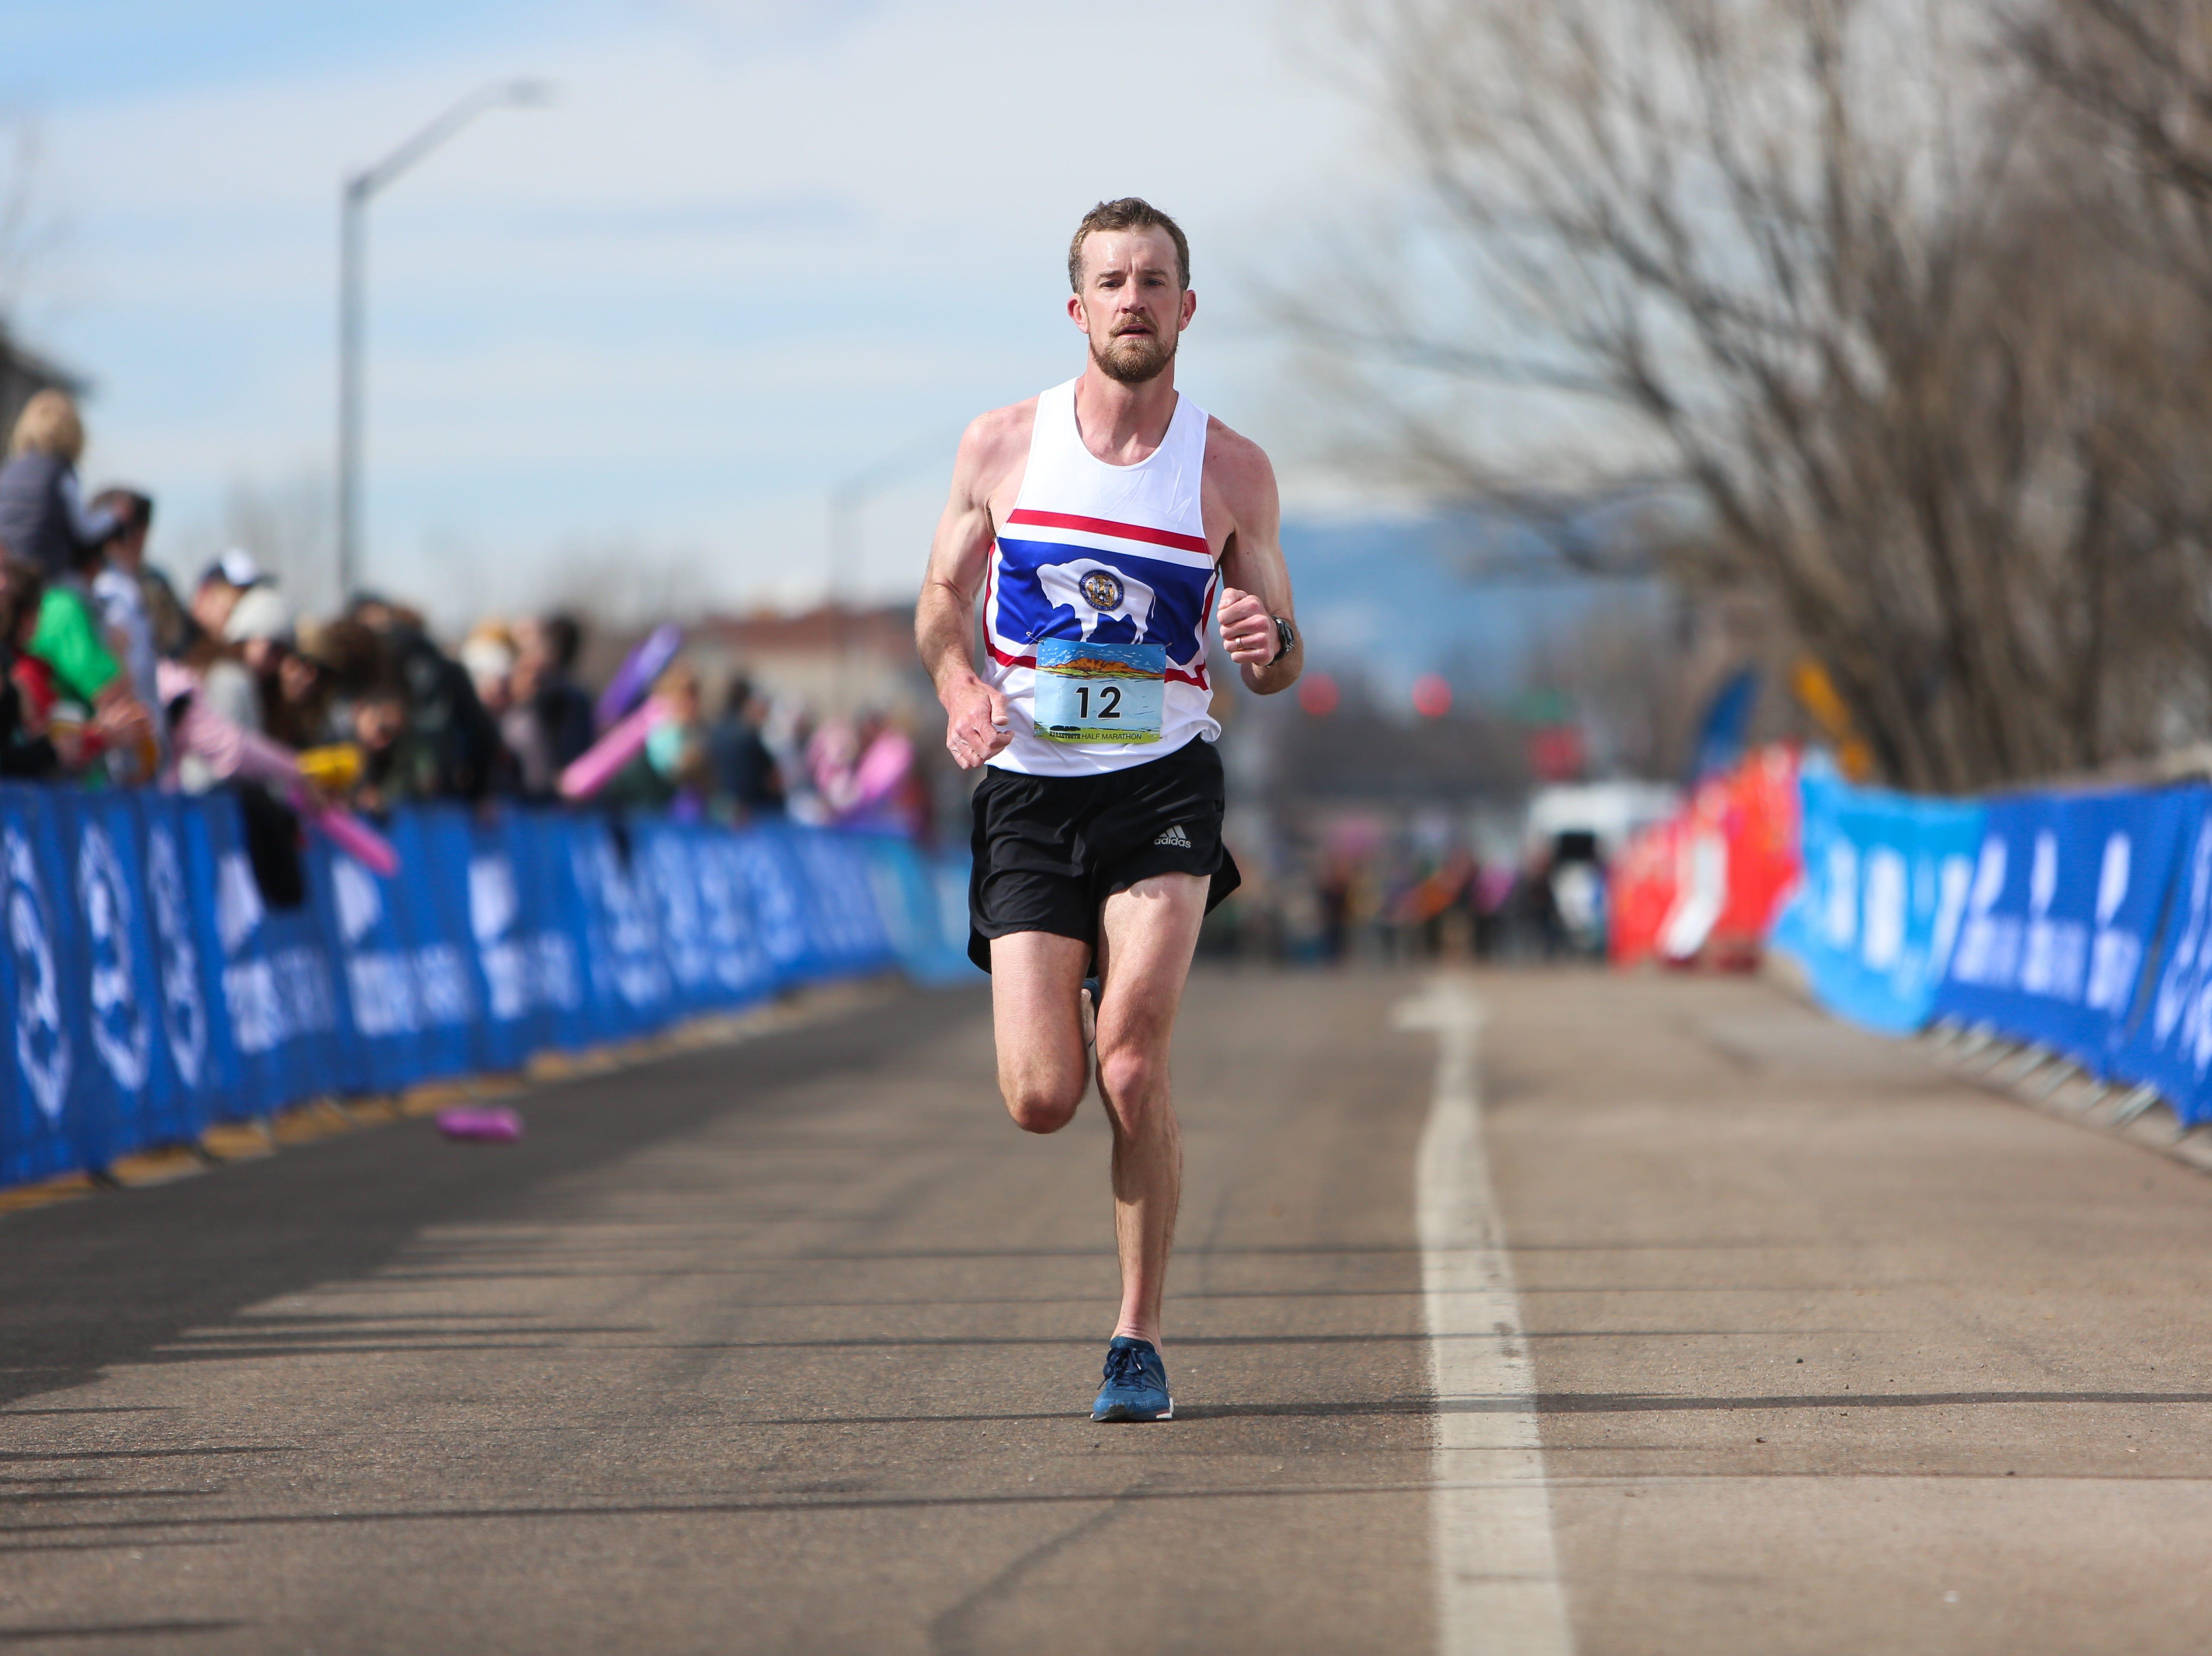 Scott Dahlberg completes the Horsetooth Half Marathon on April 14.